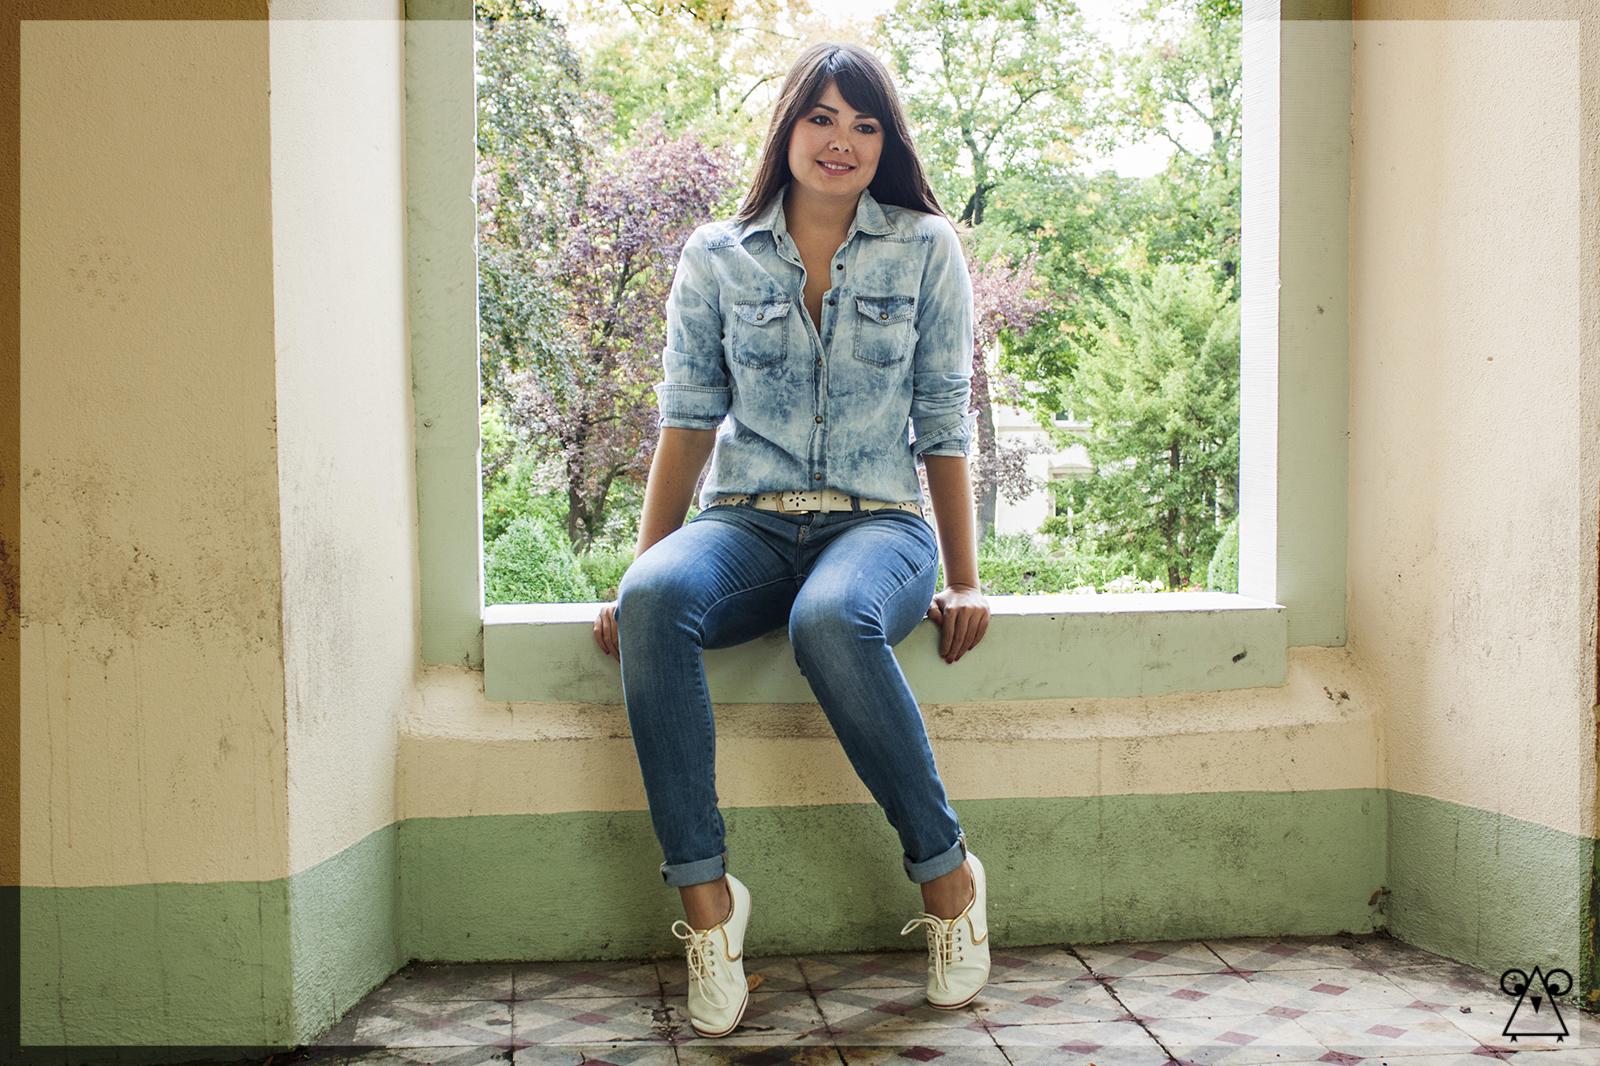 fashionambit-fashionblog-muenchen-styleblog-munich-blogger-deutschland-fashionblogger-bloggerdeutschland-style-blog-lifestyle-blog-modeblog-casual-style-